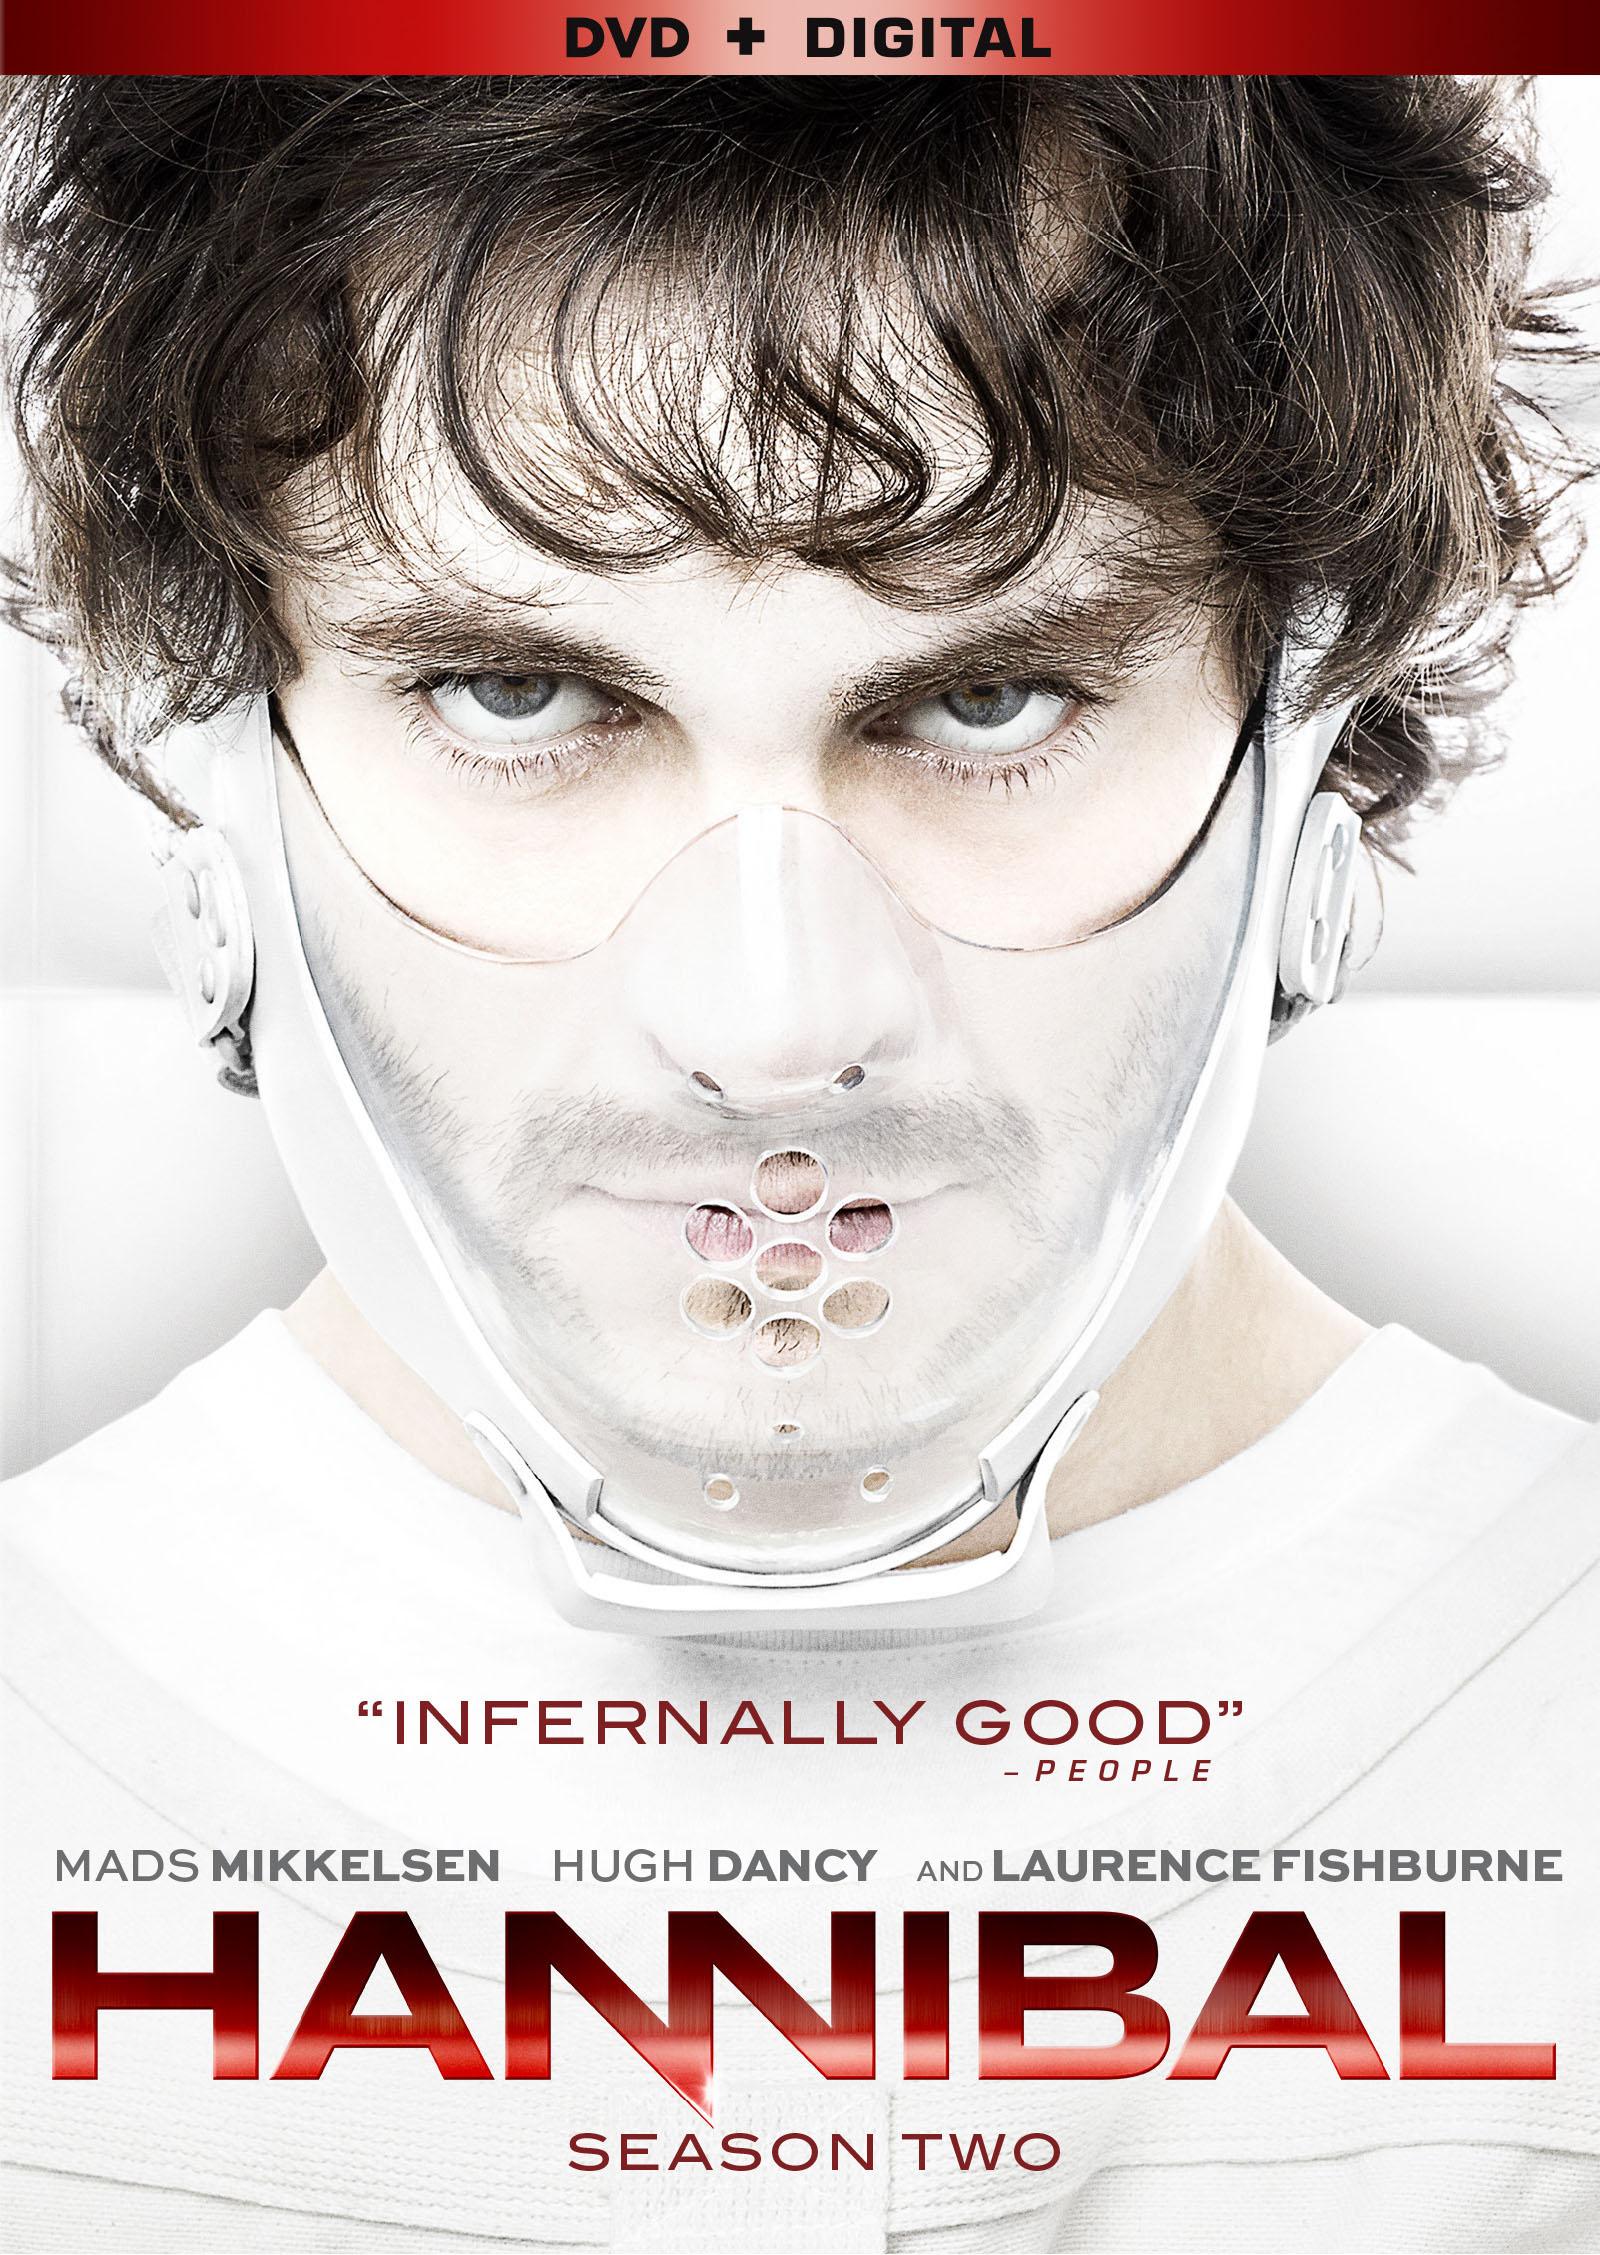 Hannibal: Season Two [includes Digital Copy[ (dvd) 8230349